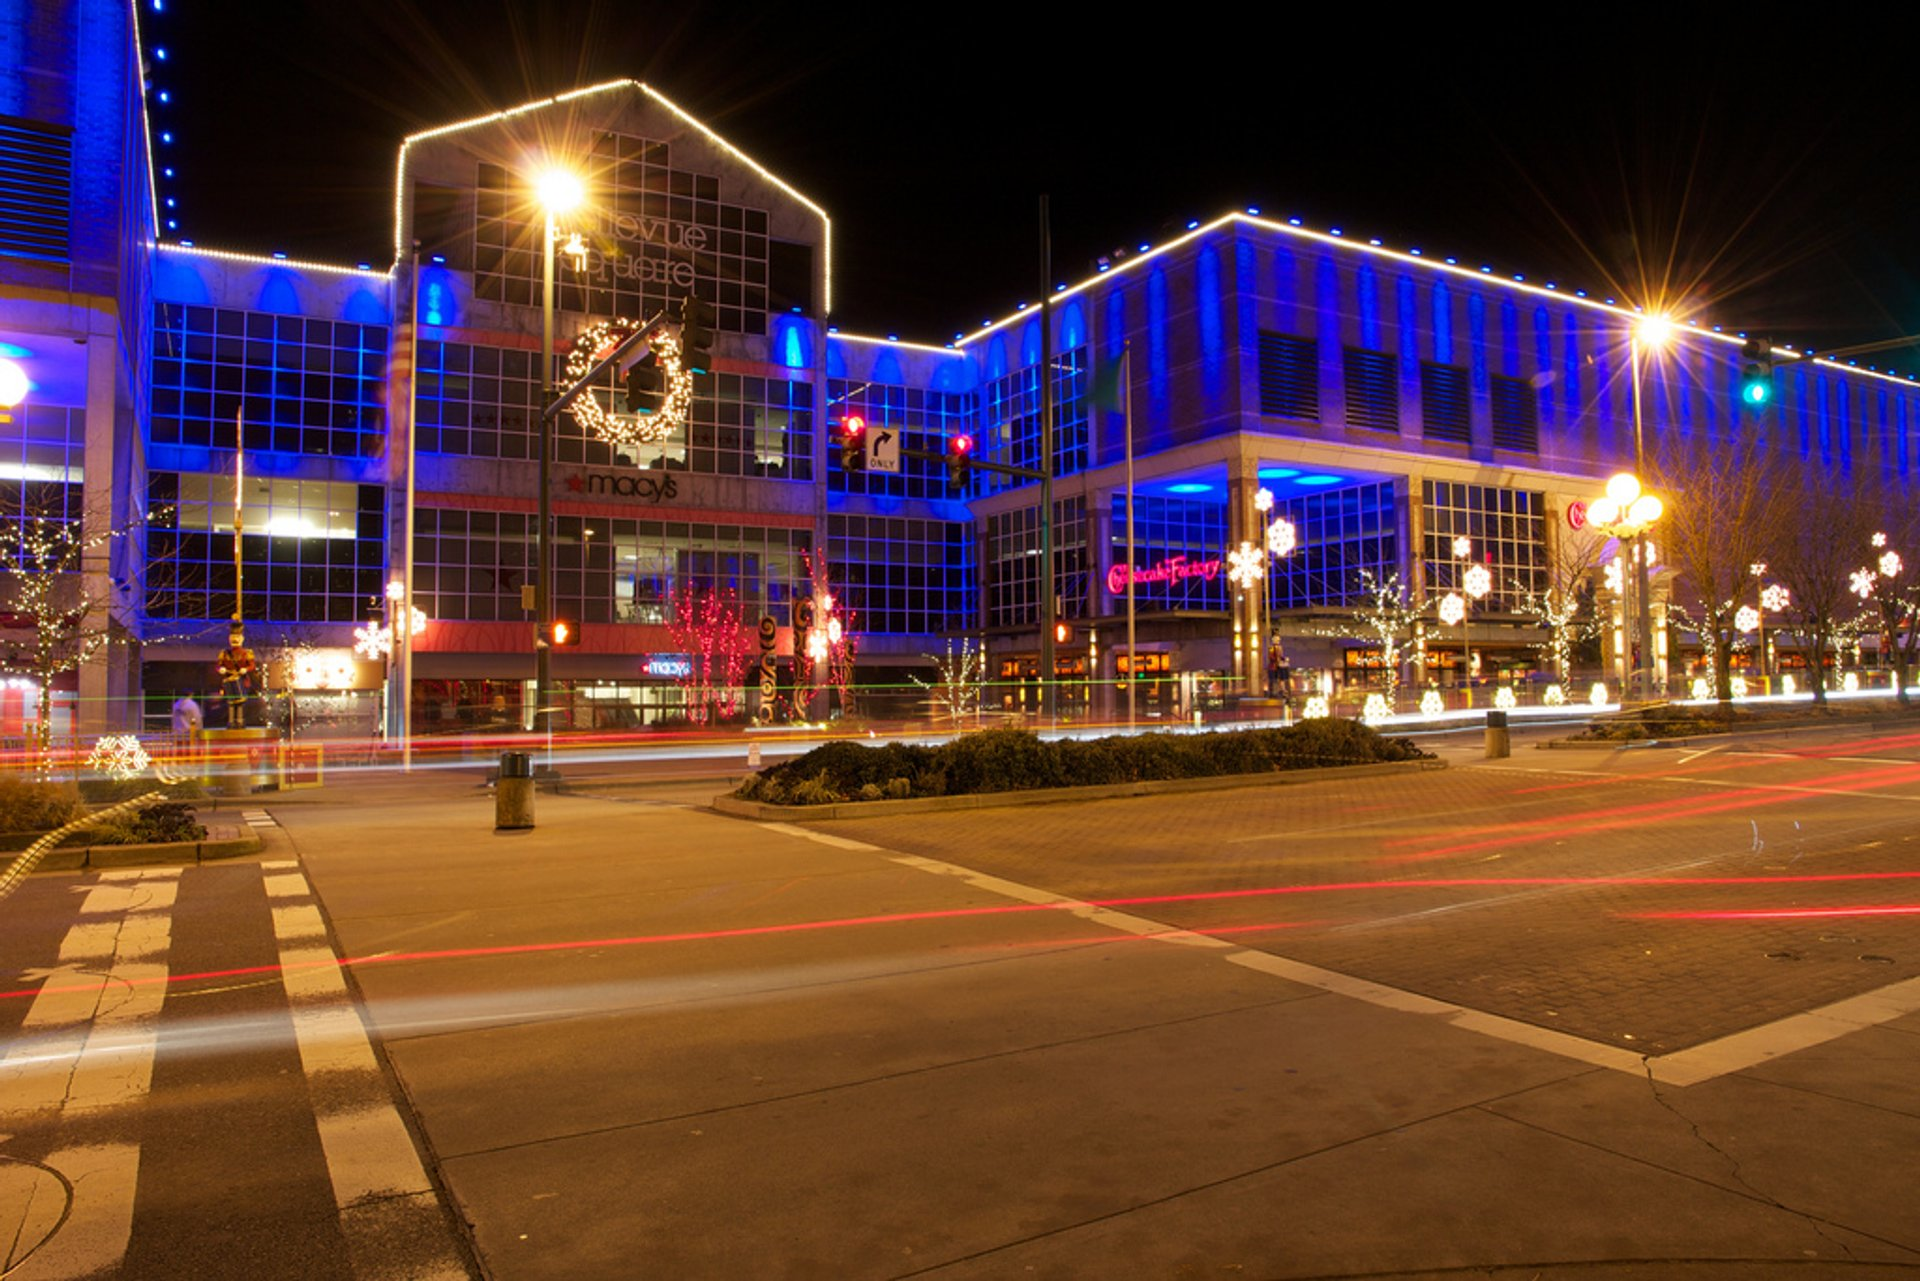 Christmas decoration inside Bellevue Square 2020